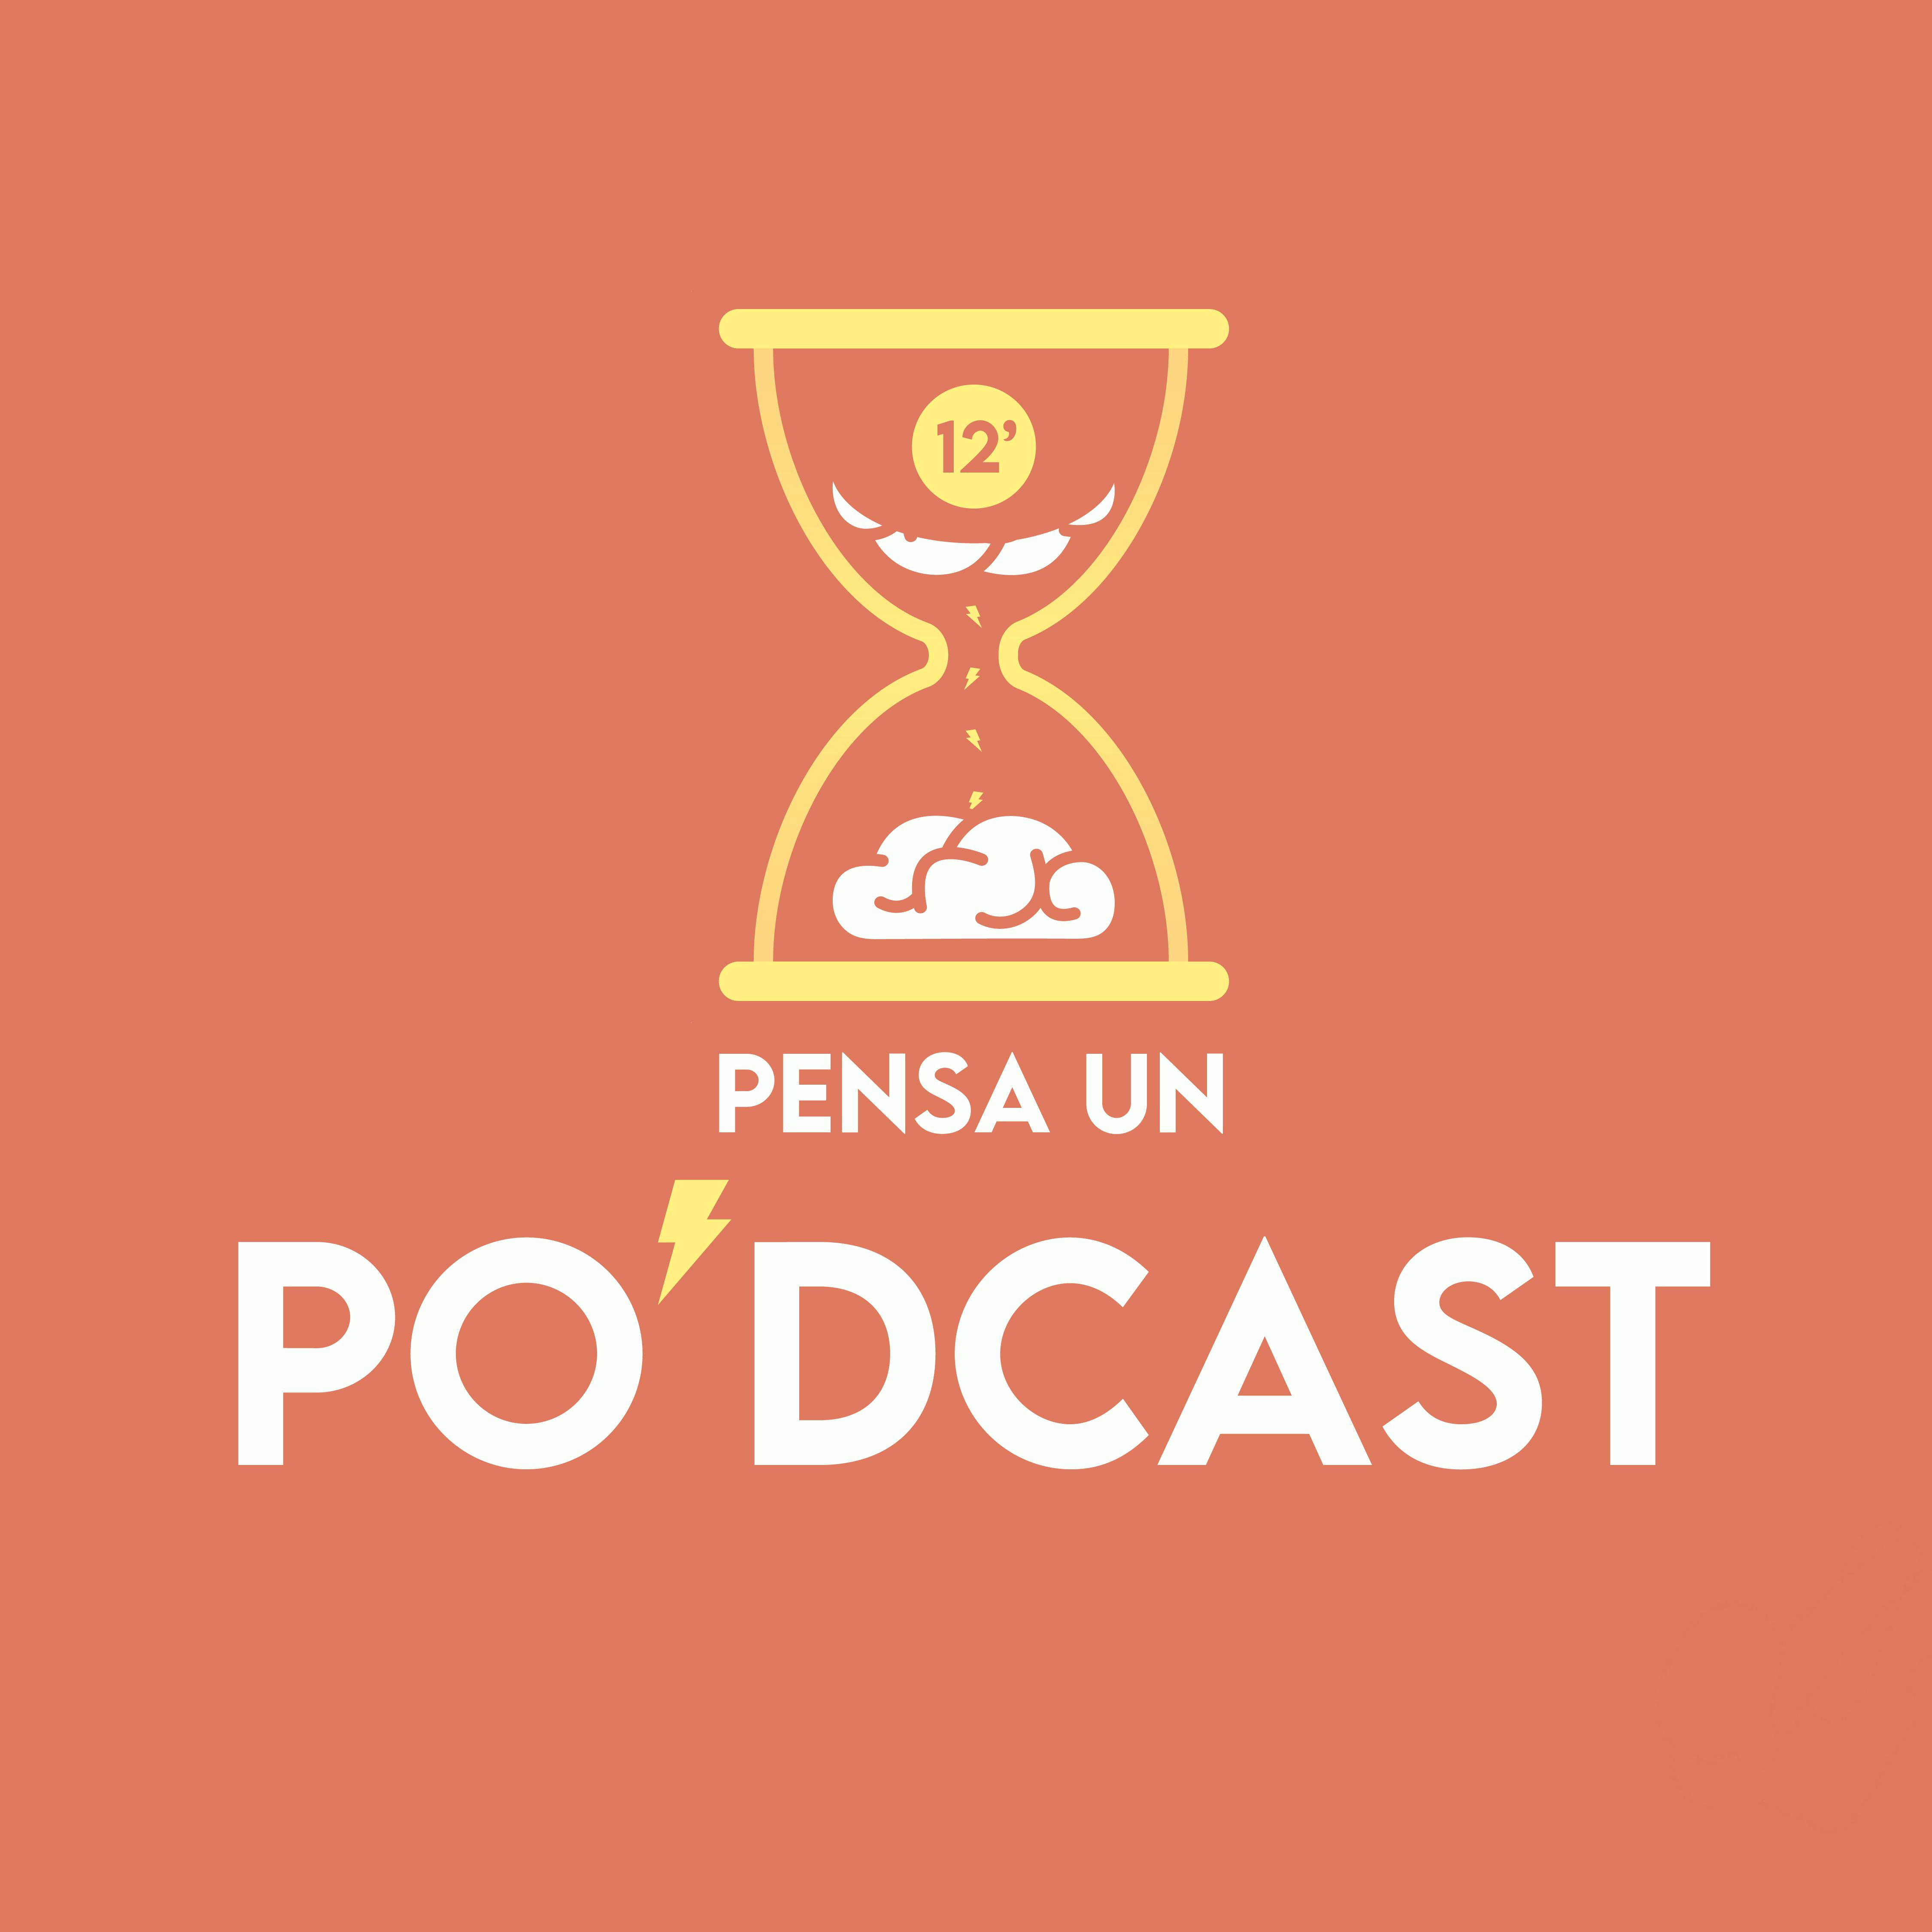 Pensa un Podcast